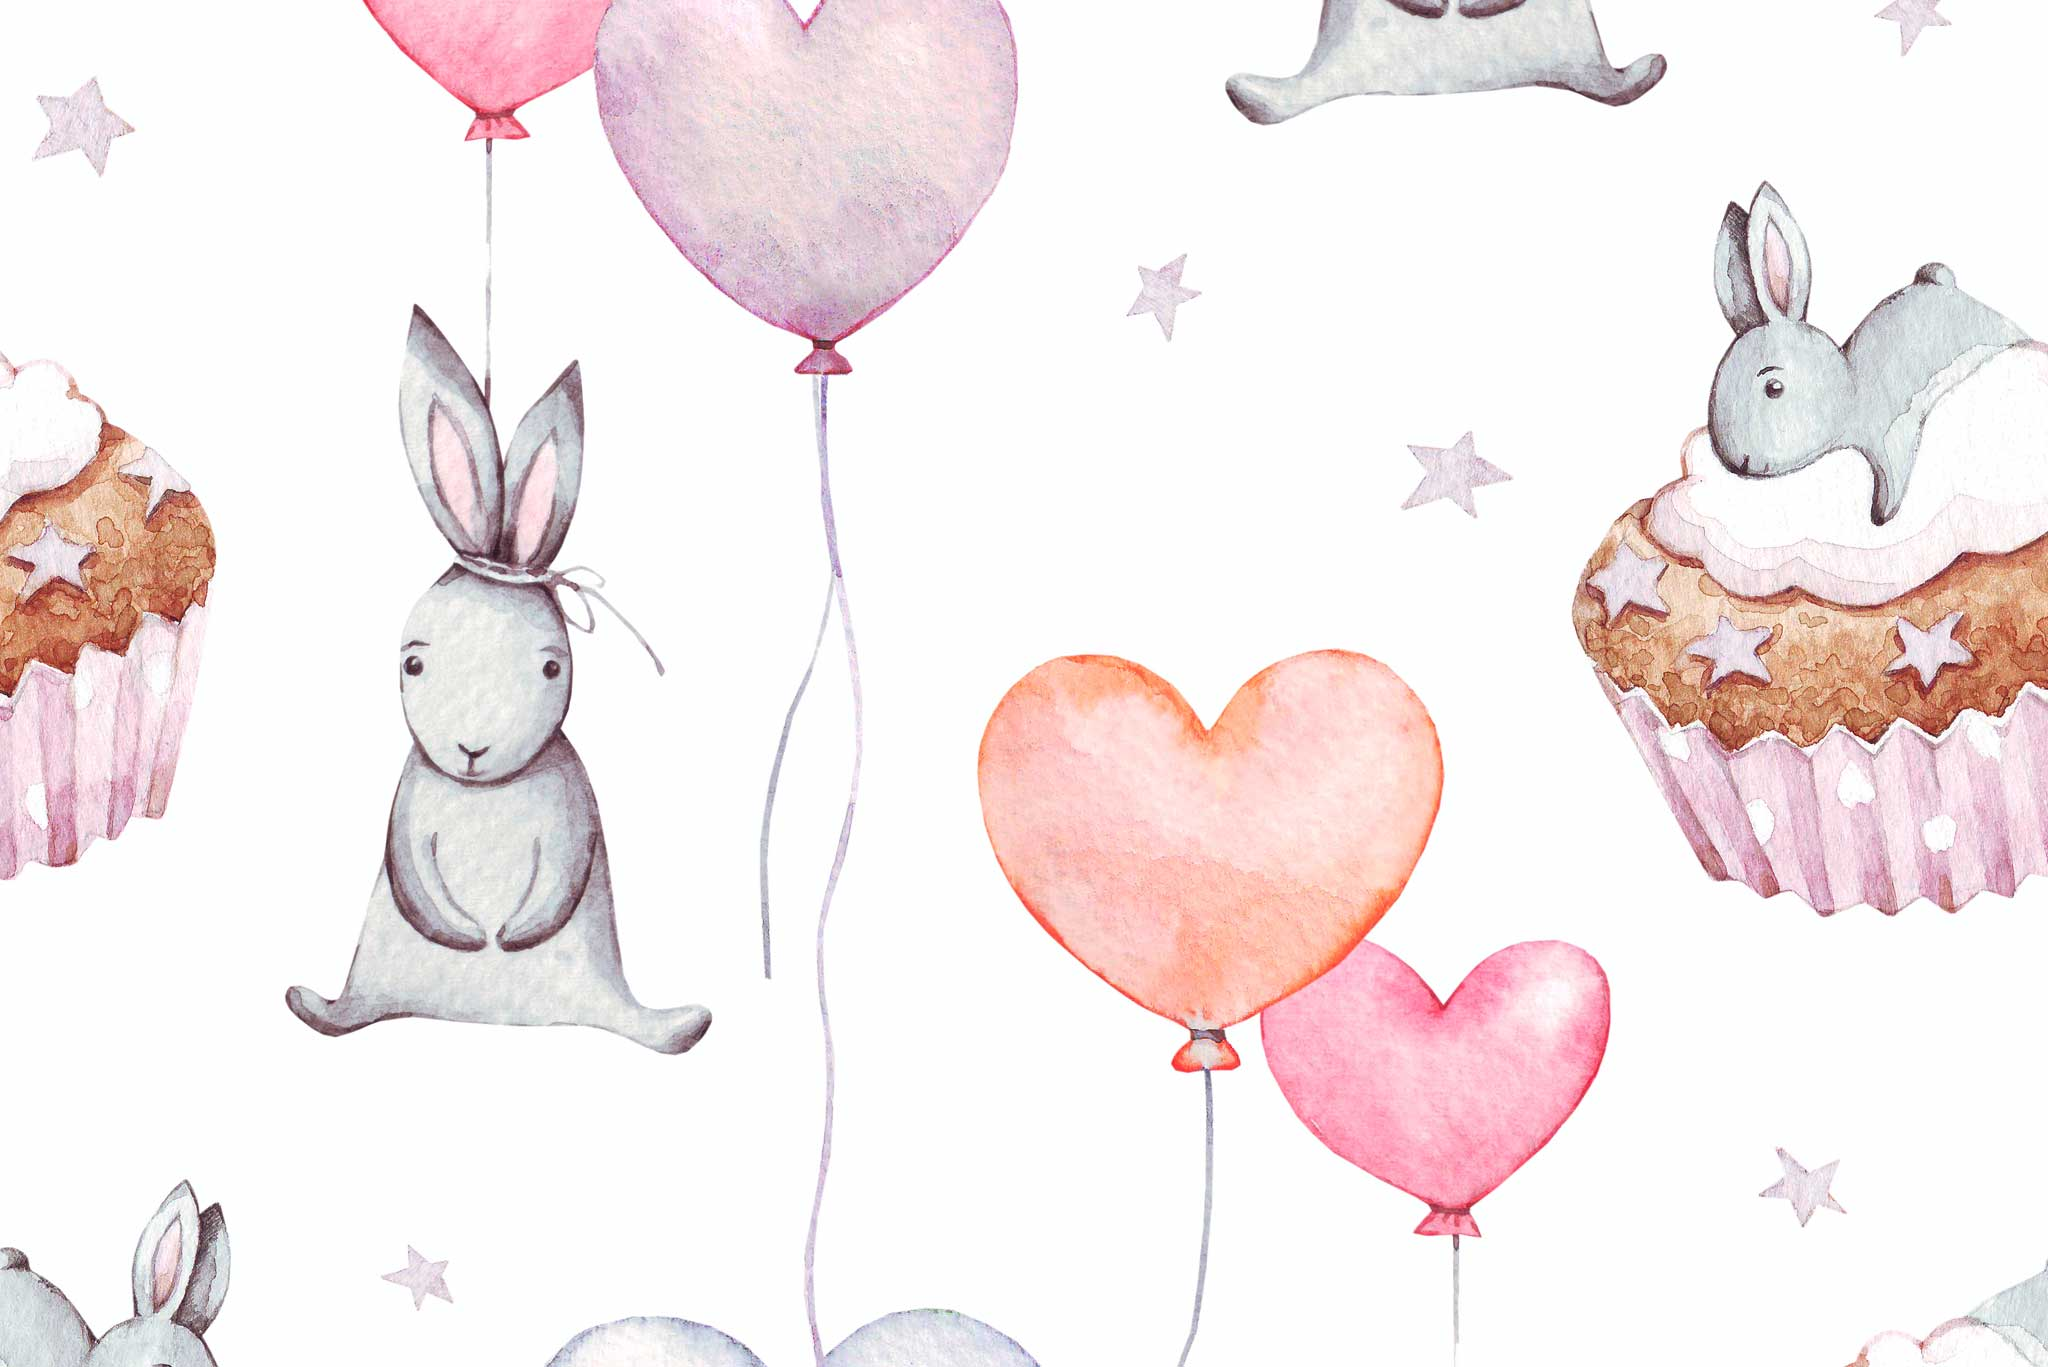 tapet-fototapet-design-decor-mural-customizabil-comanda-personalizat-bucuresti-daring-prints-motiv-model-copii-iepurasi-prajituri-roz-baloane-inimioare